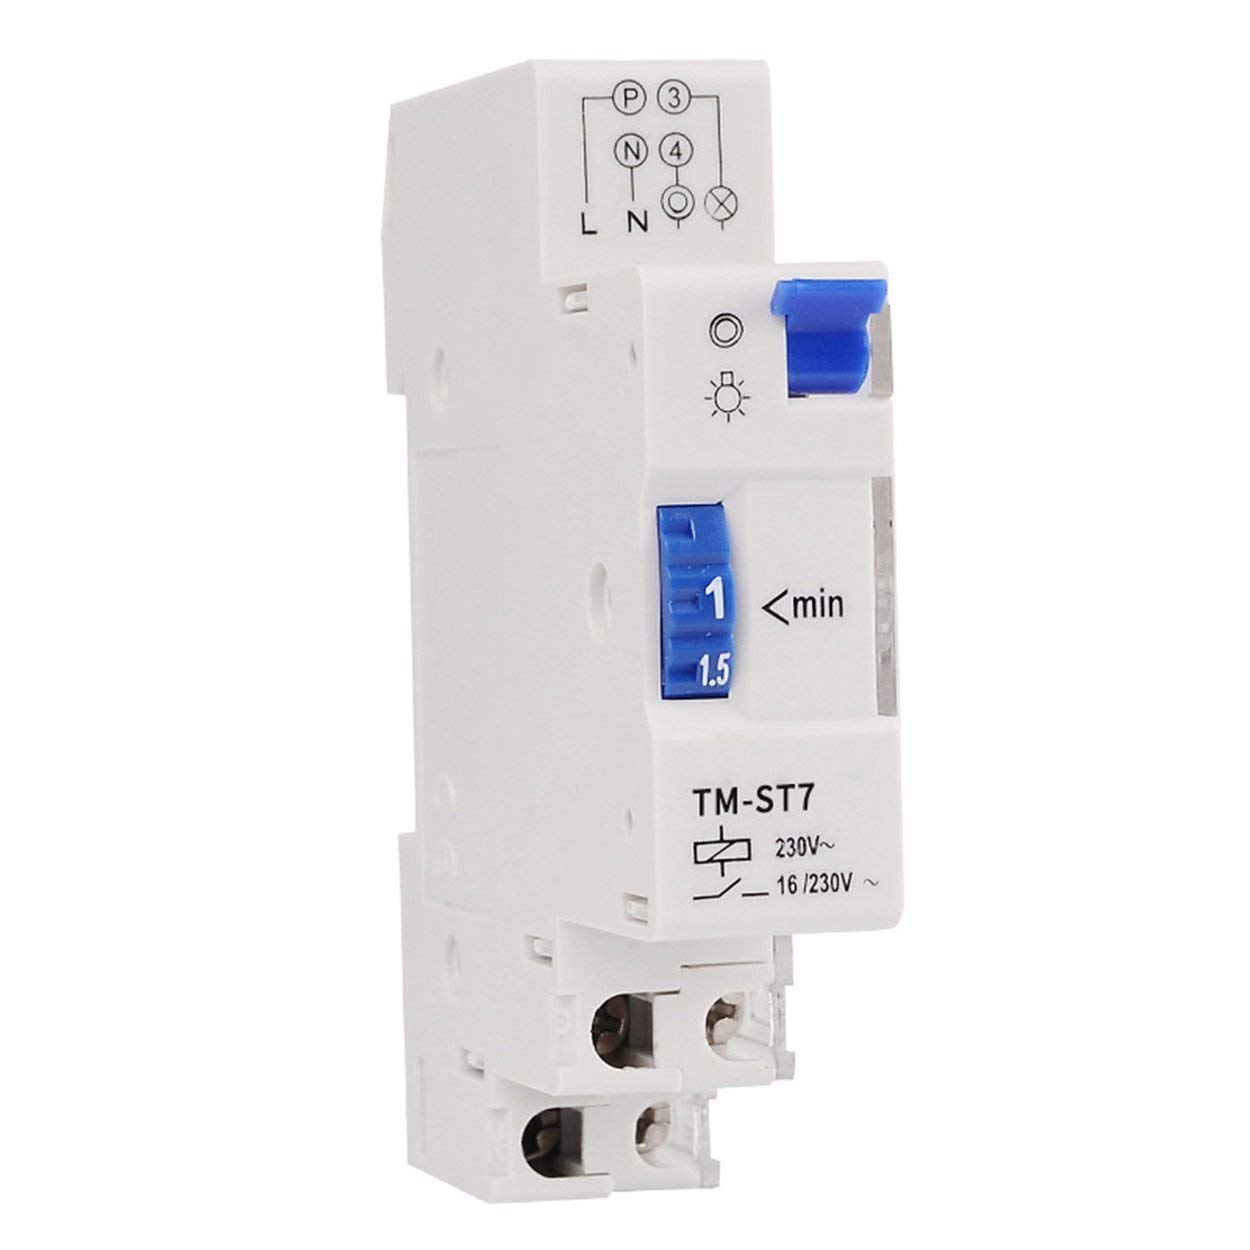 Lorenlli para TM-ST7 220V 7 Minutos Temporizador mec/ánico 18 mm M/ódulo /único DIN Rail Escalera Temporizador Interruptor de Tiempo Instrumentos